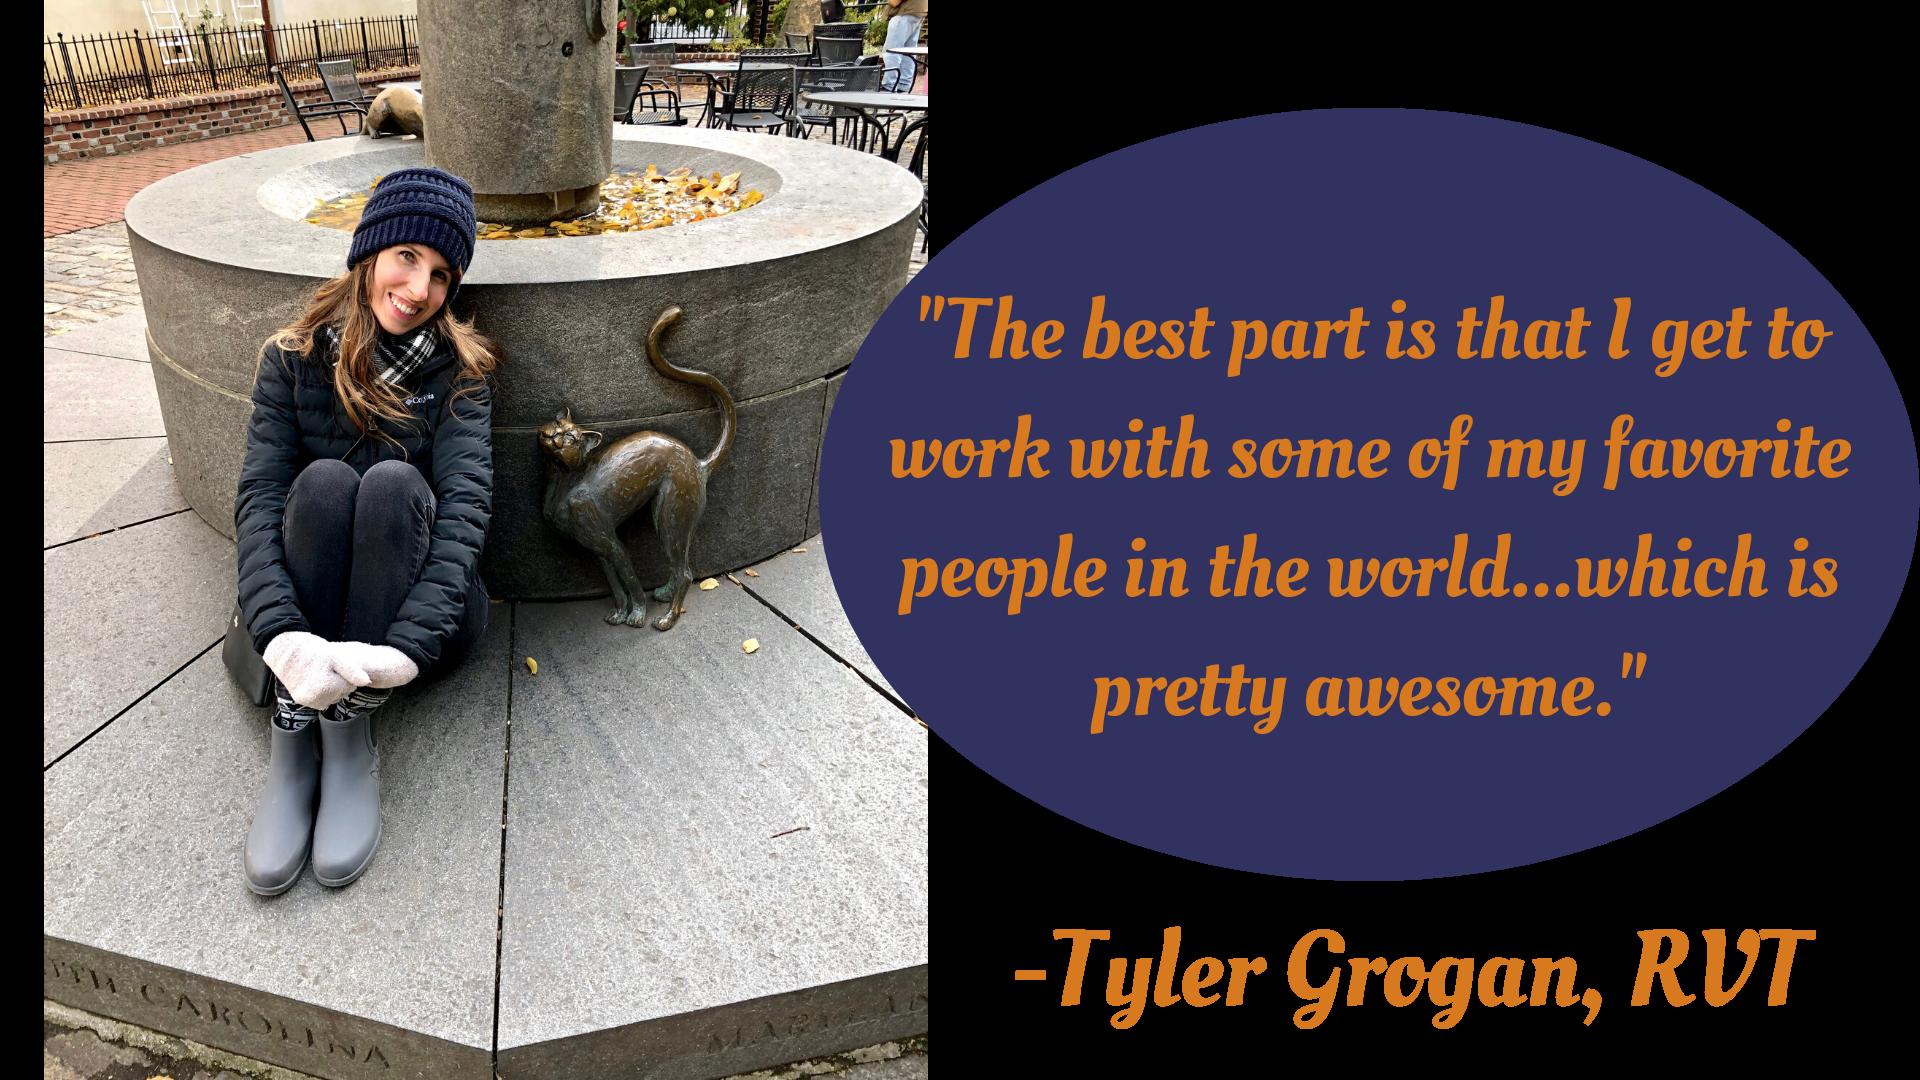 Tyler Grogan, RVT